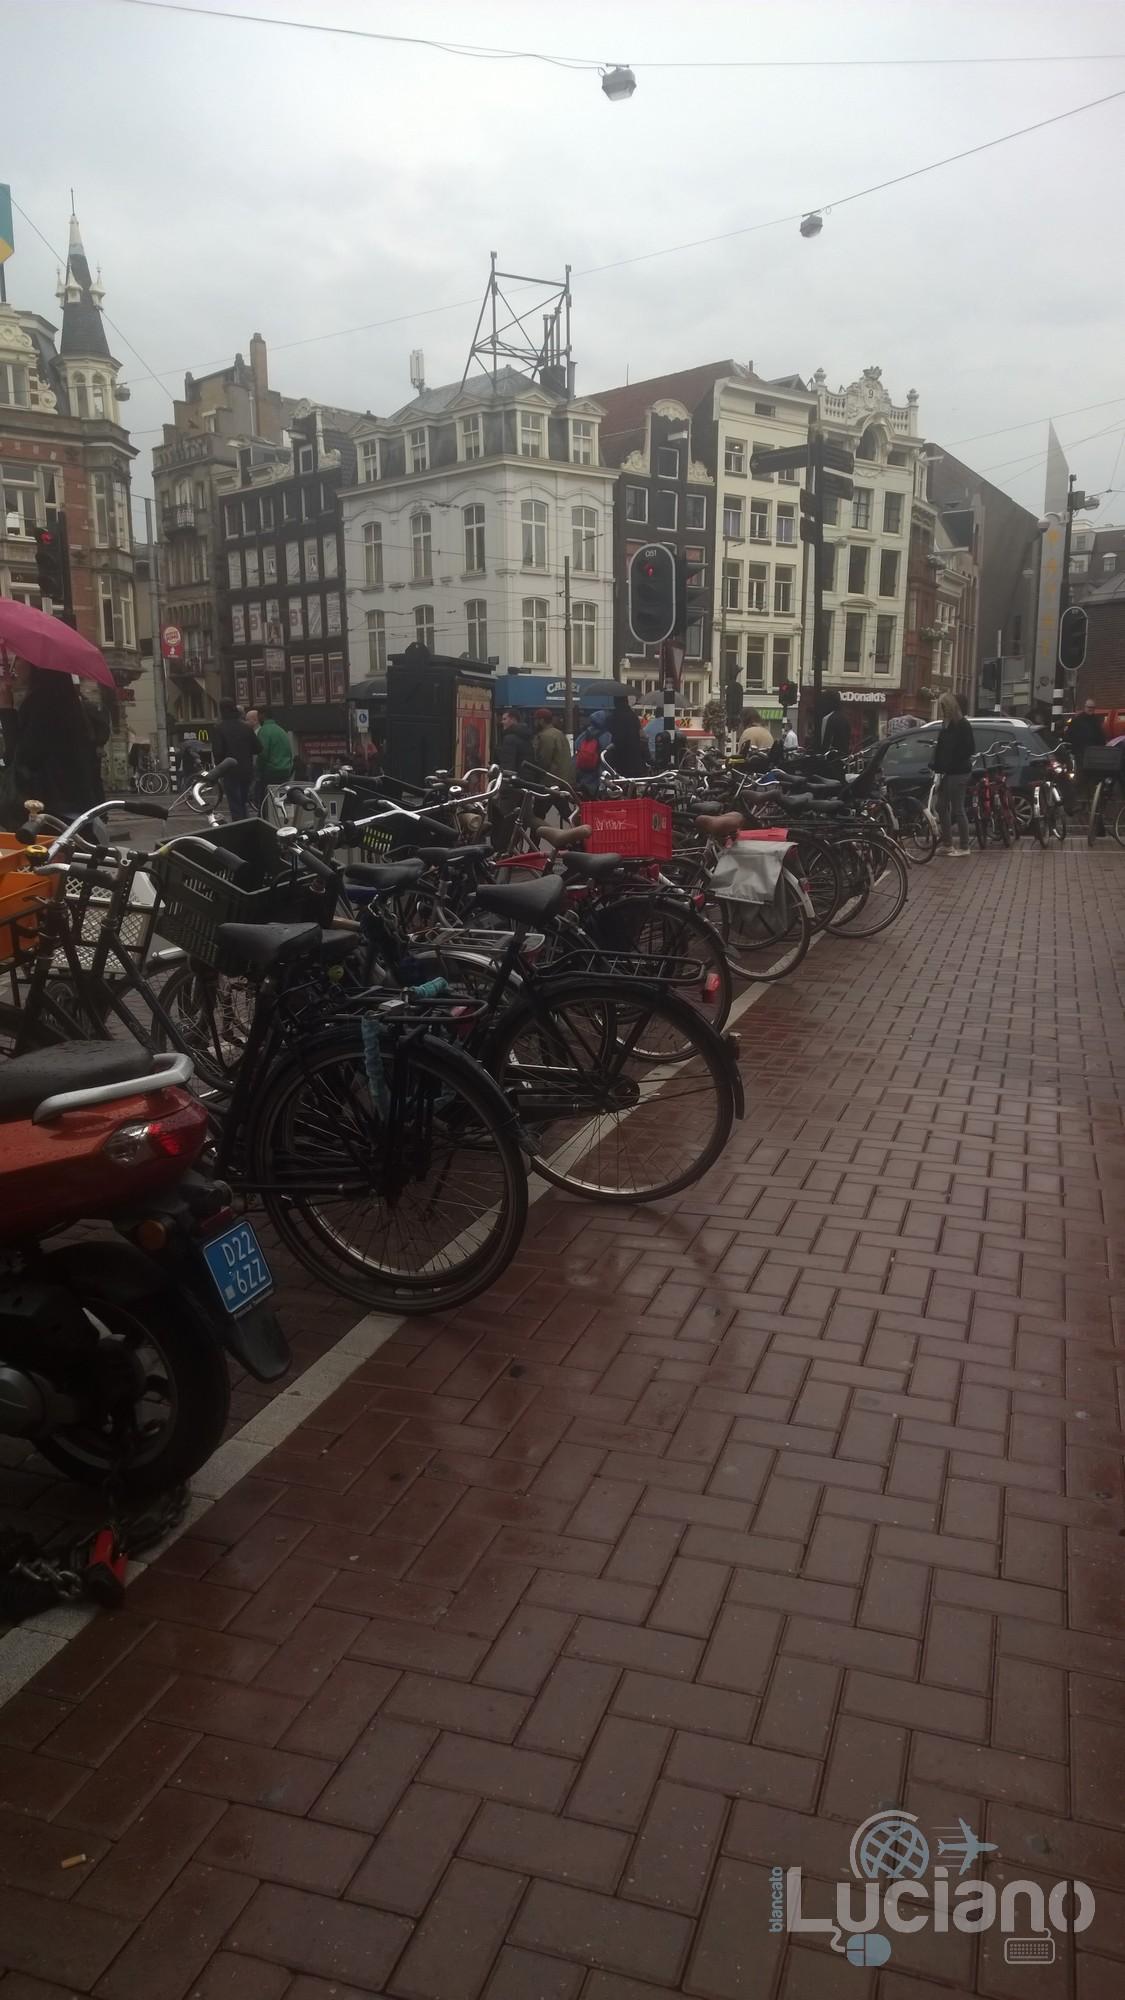 amsterdam-2014-vueling-lucianoblancatoit (161)